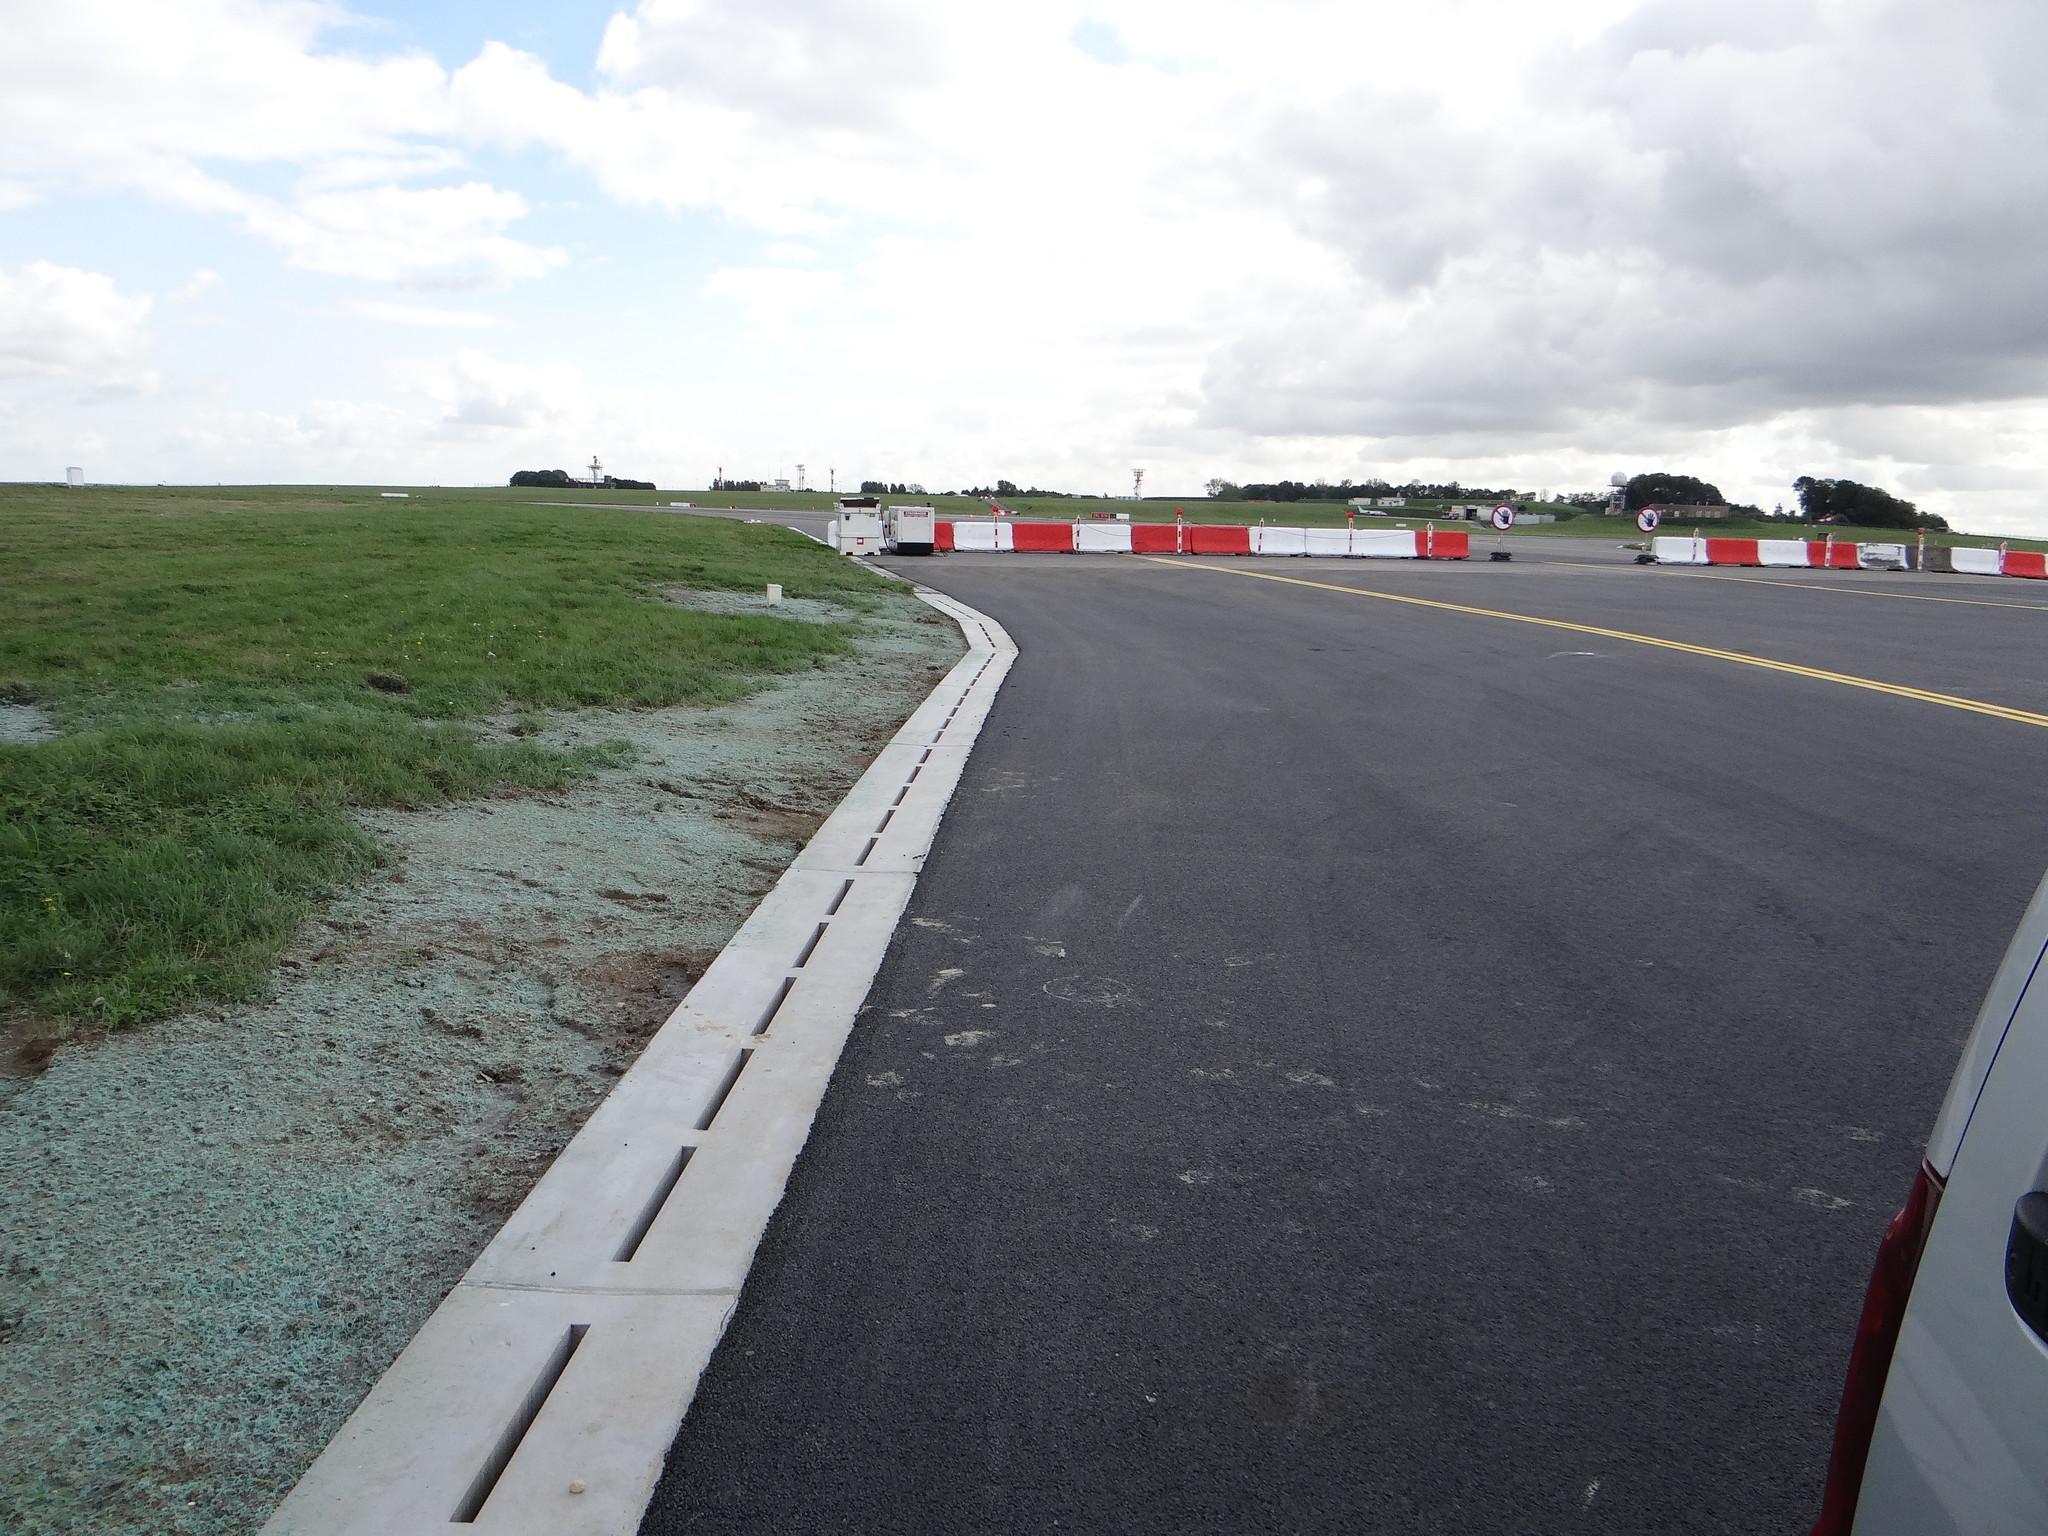 Airport-Verholen-Goot-Diederen-Drainage technology